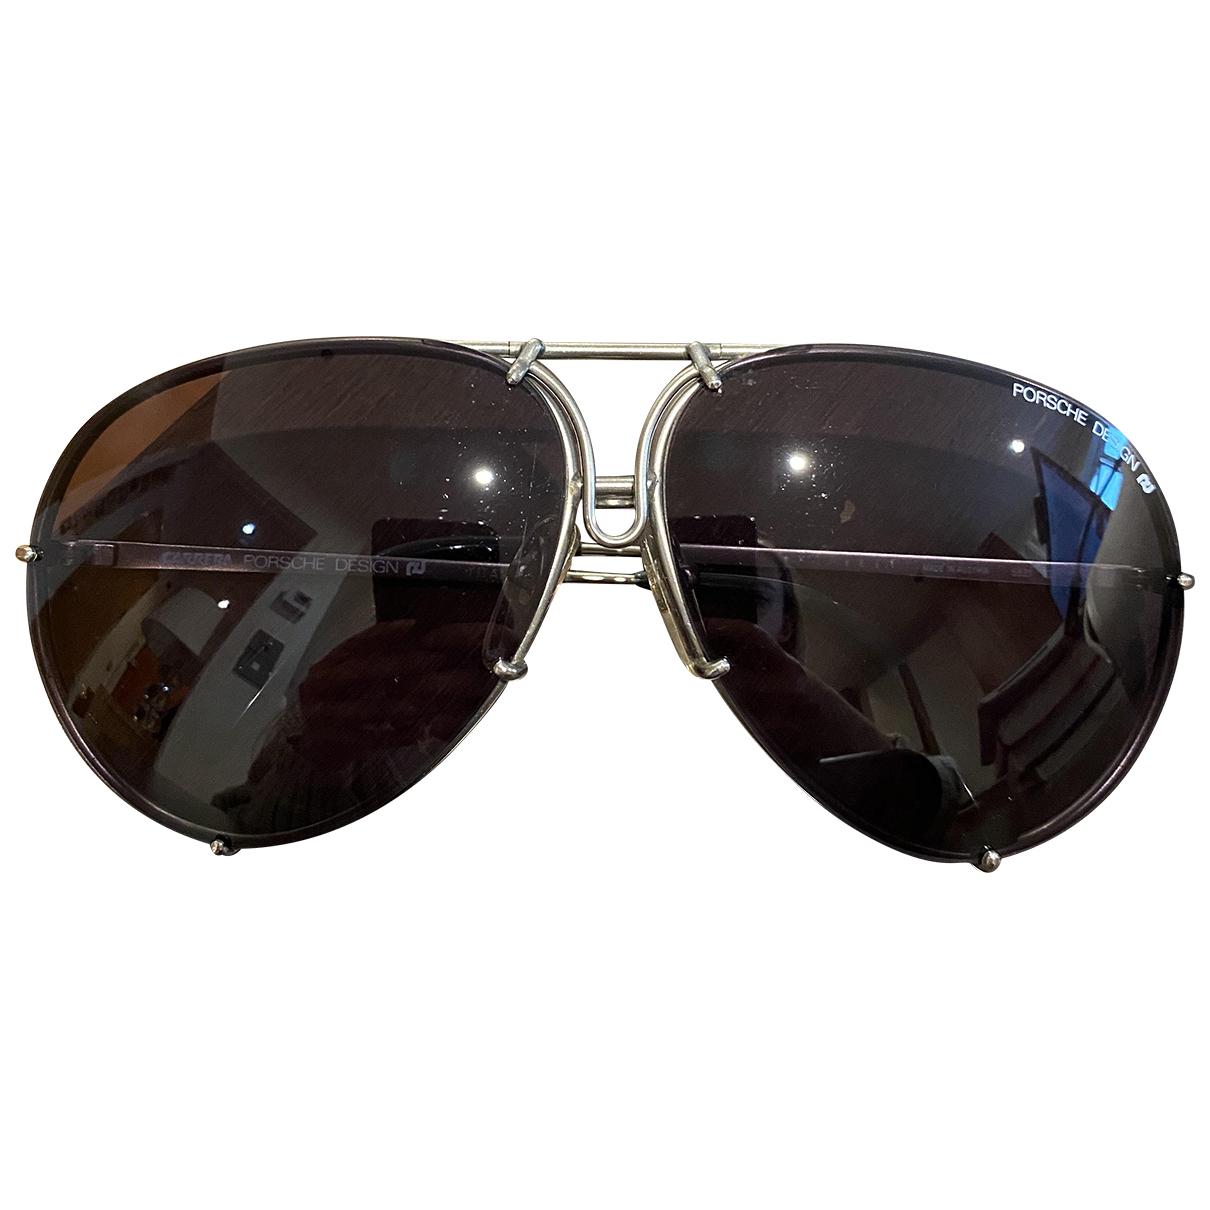 Porsche Design N Black Metal Sunglasses for Women N